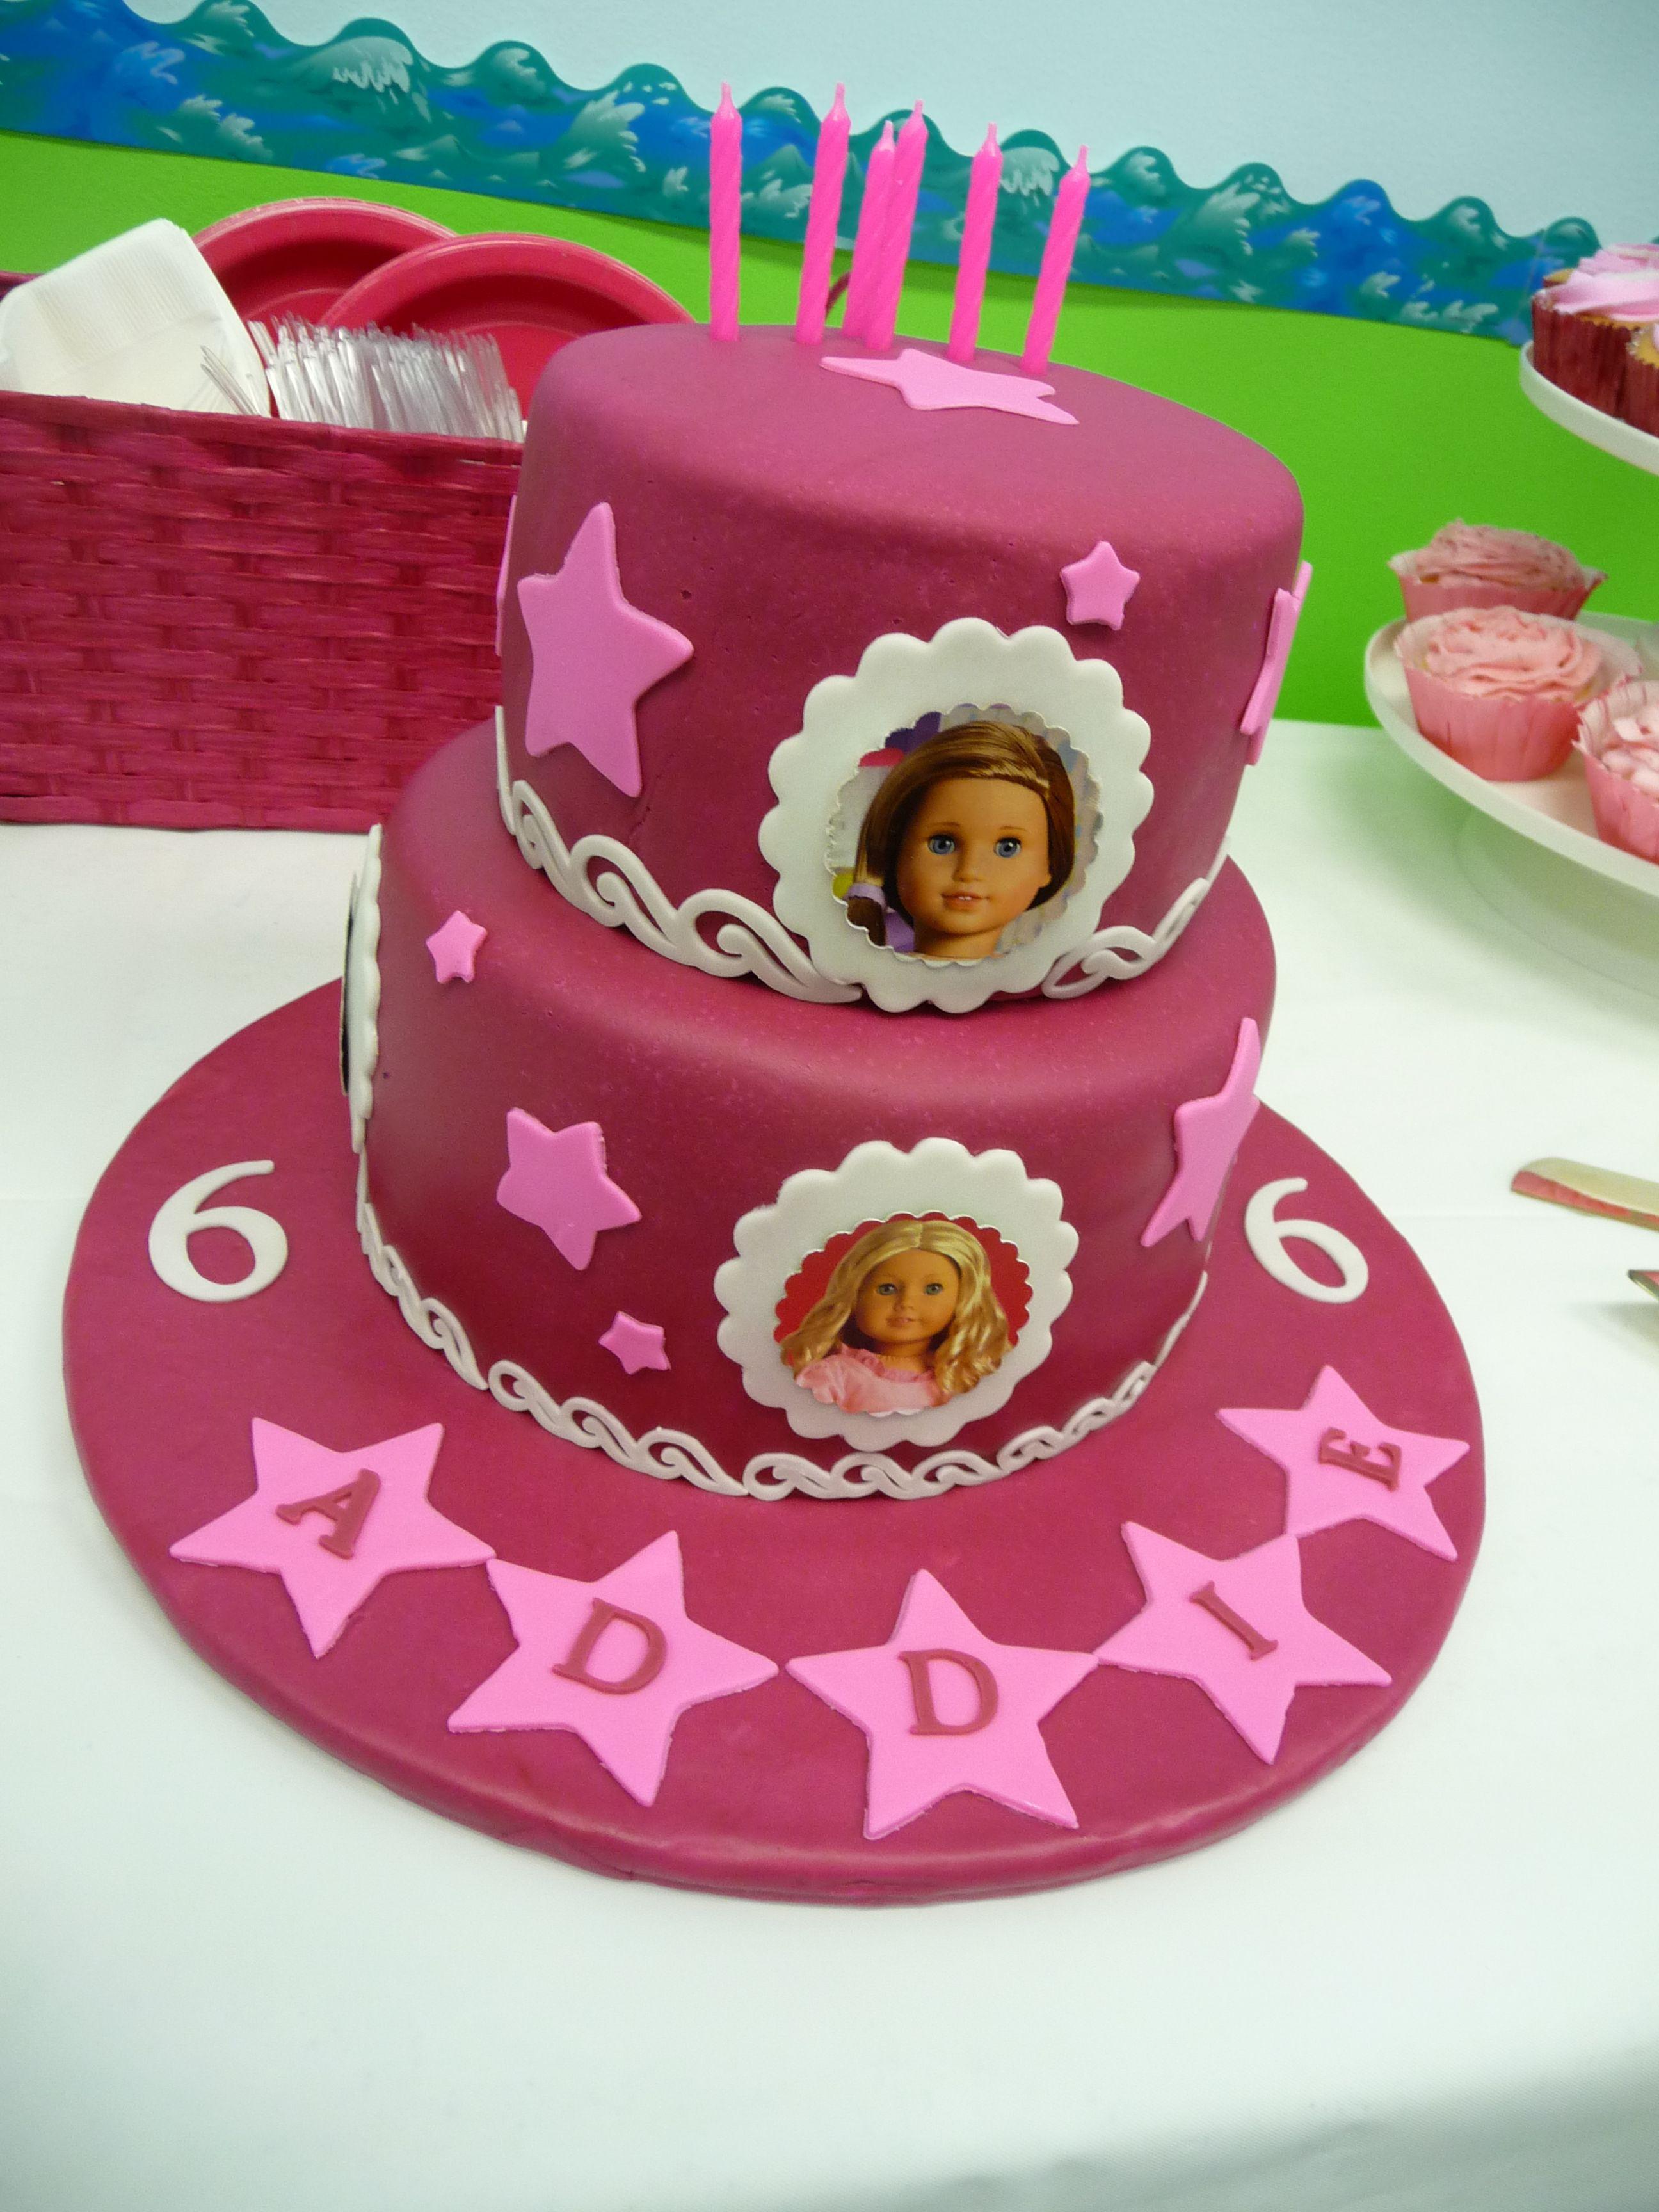 Astounding American Girl American Girl Birthday American Girl Cakes Personalised Birthday Cards Paralily Jamesorg